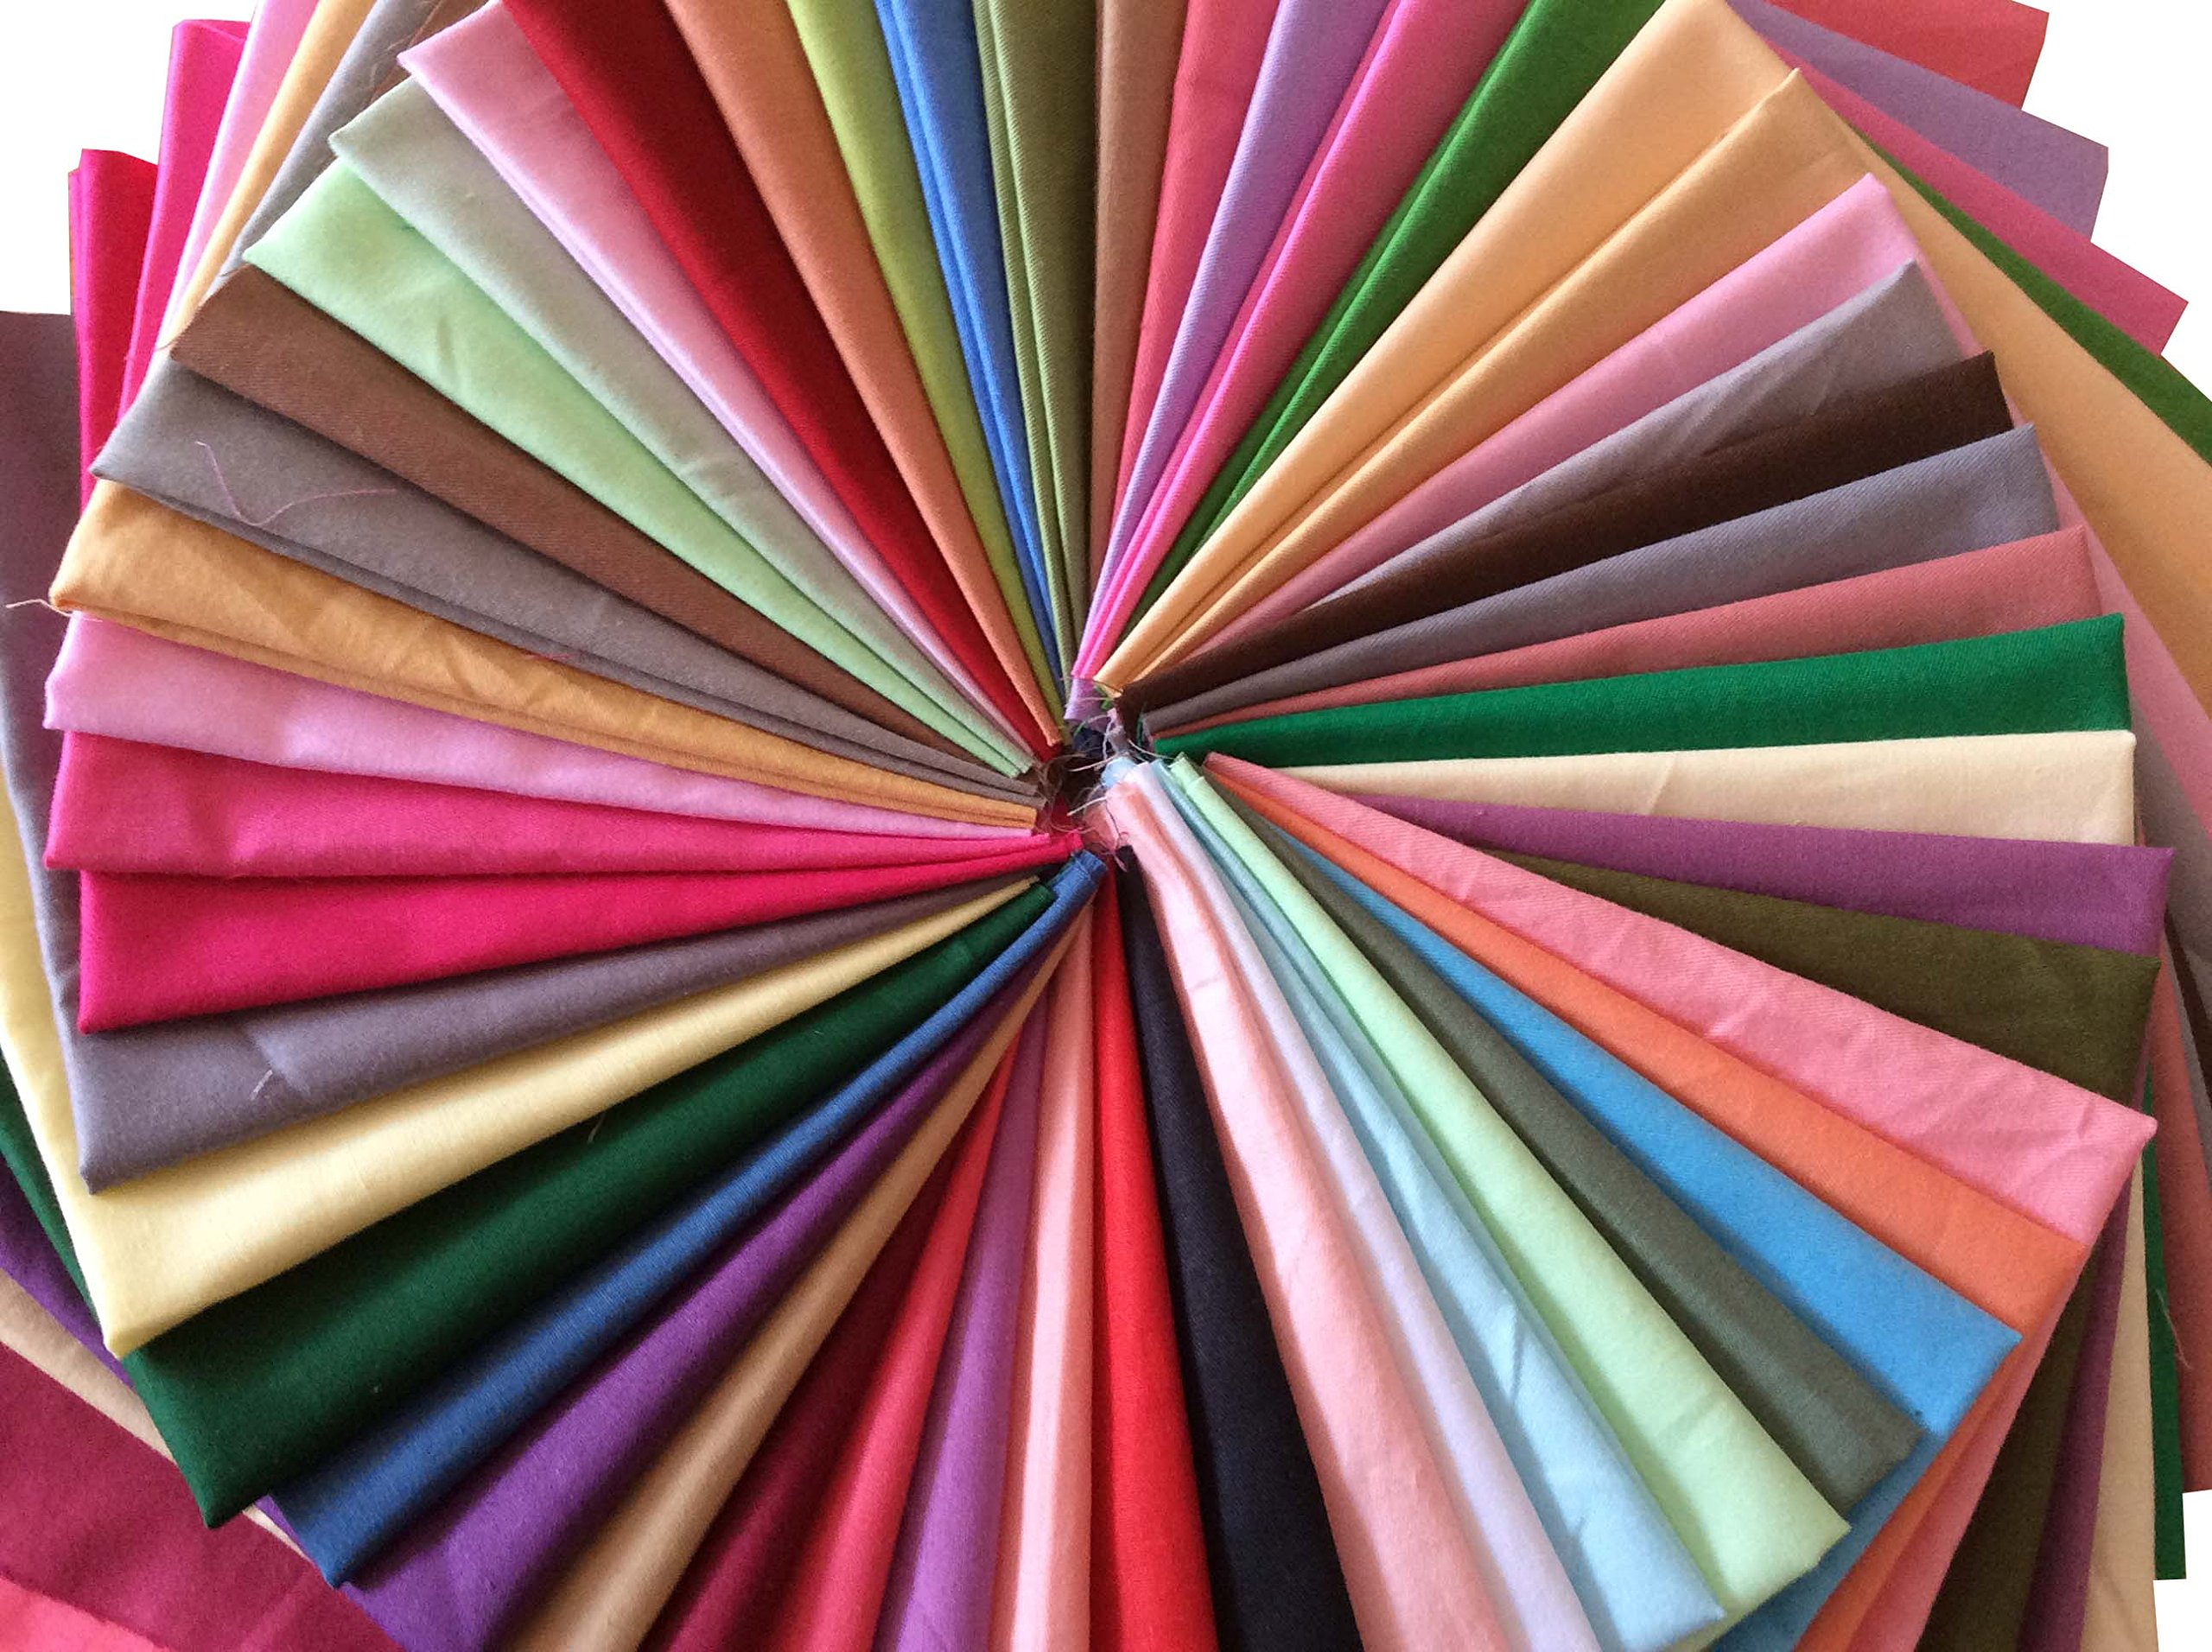 longshine-us 25pcs Solid Colors Premium Cotton Craft Fabric Bundle Squares Patchwork Lint DIY Sewing Scrapbooking Quilting Dot Pattern Artcraft (10'' x 10'') by longshine-us (Image #7)